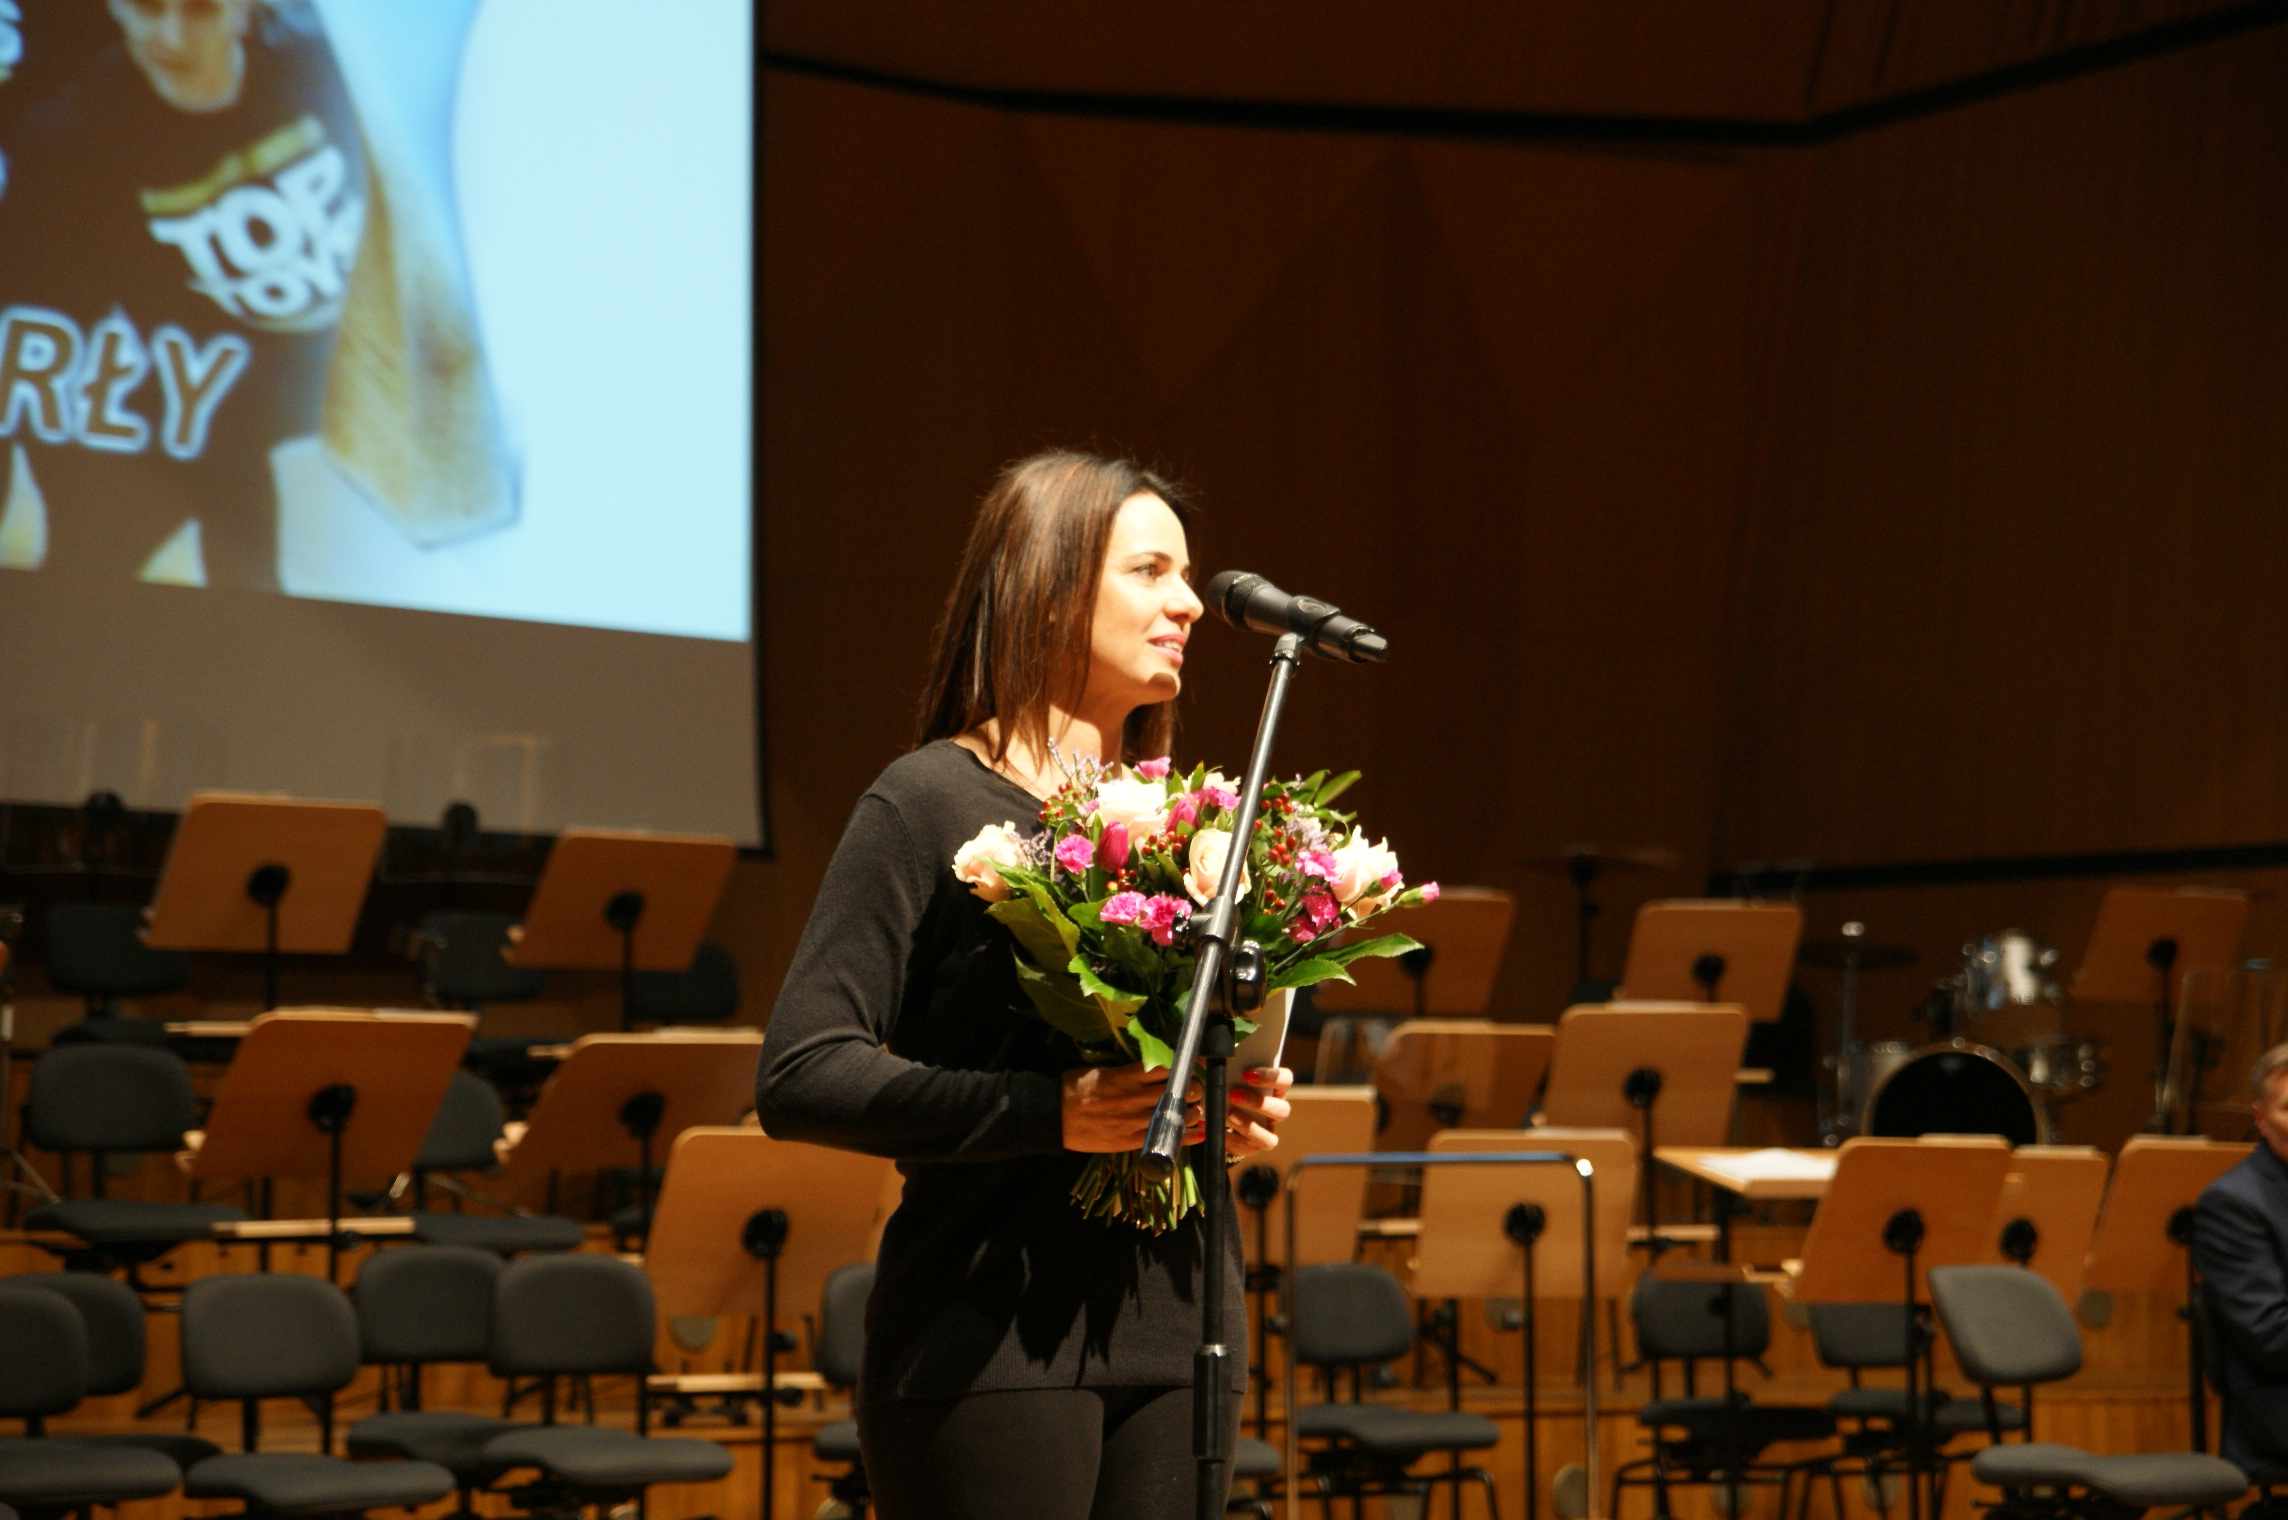 Anna Dubrownik